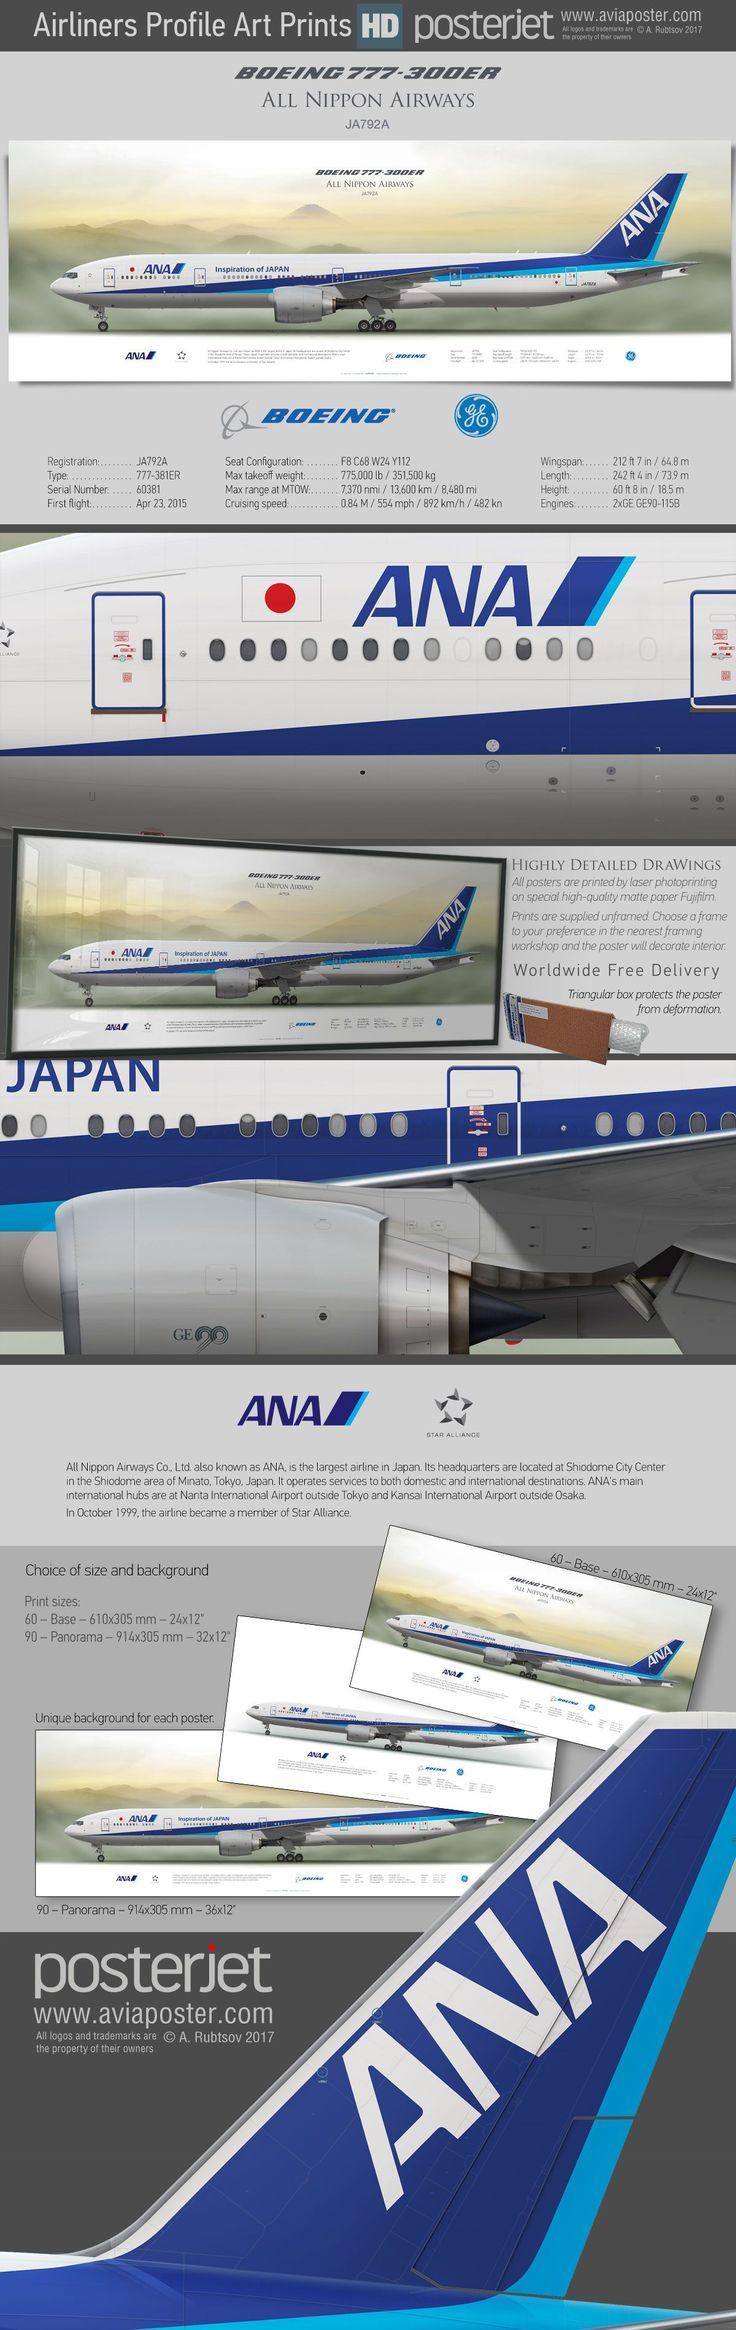 ANA Boeing 777-300ER #aviationpilotairports